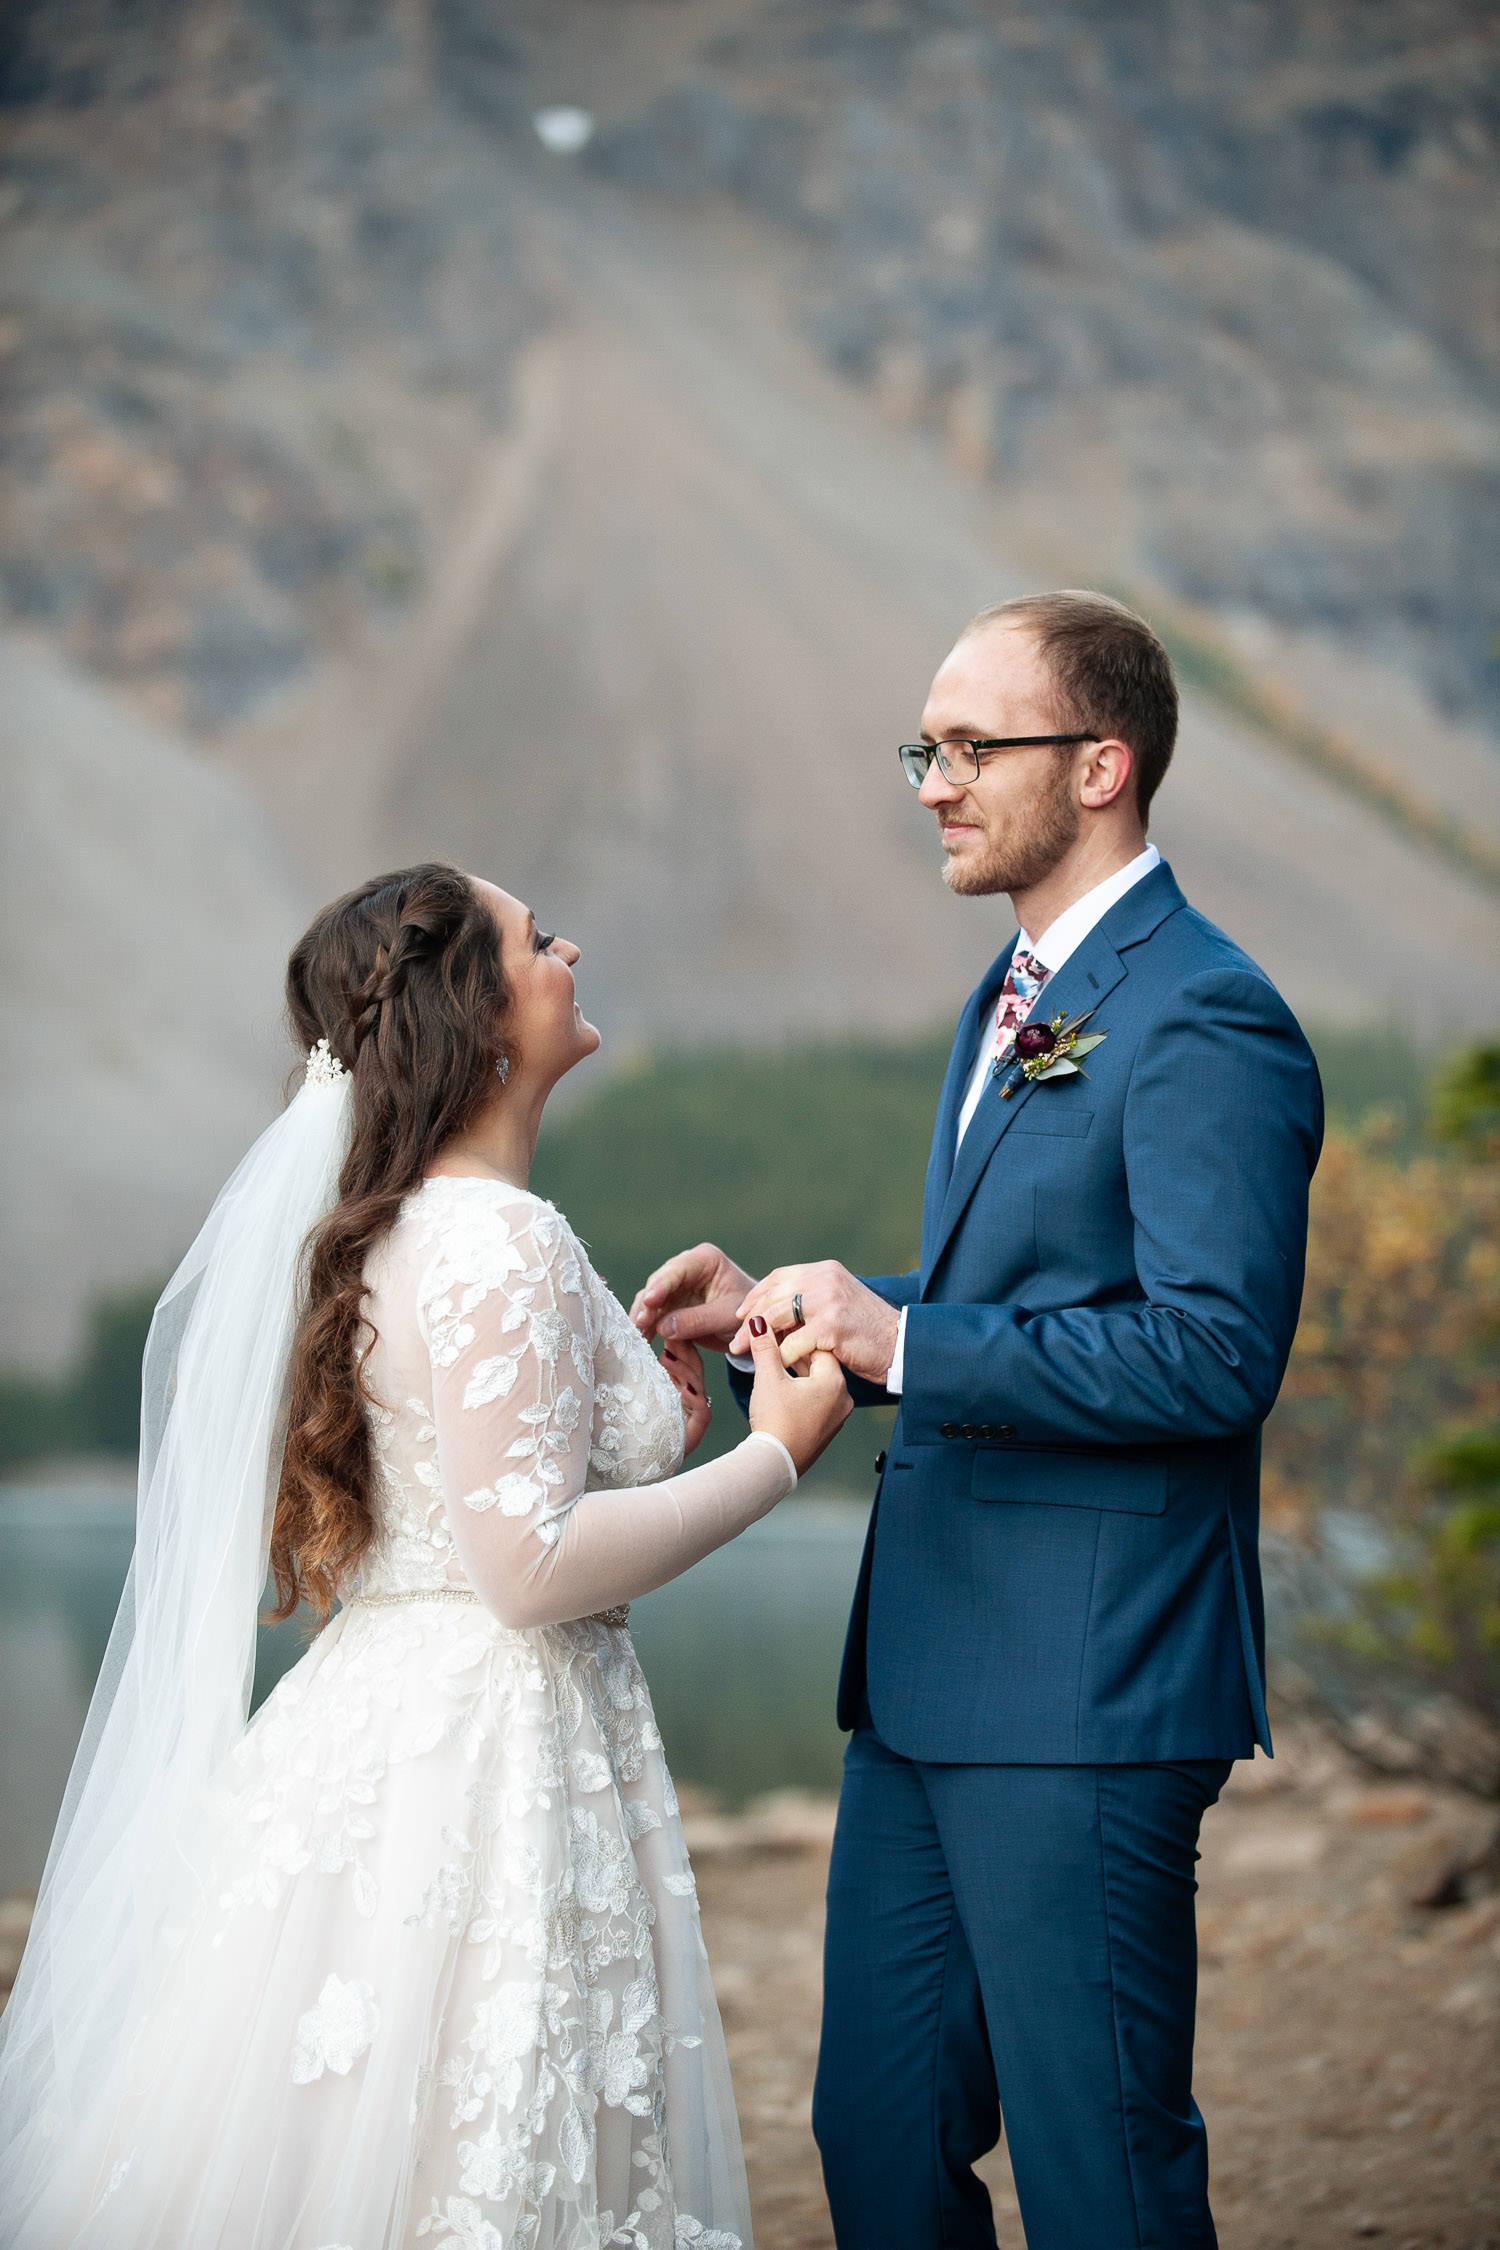 Just married at Moraine Lake capture by Calgary wedding photographer Tara Whittaker